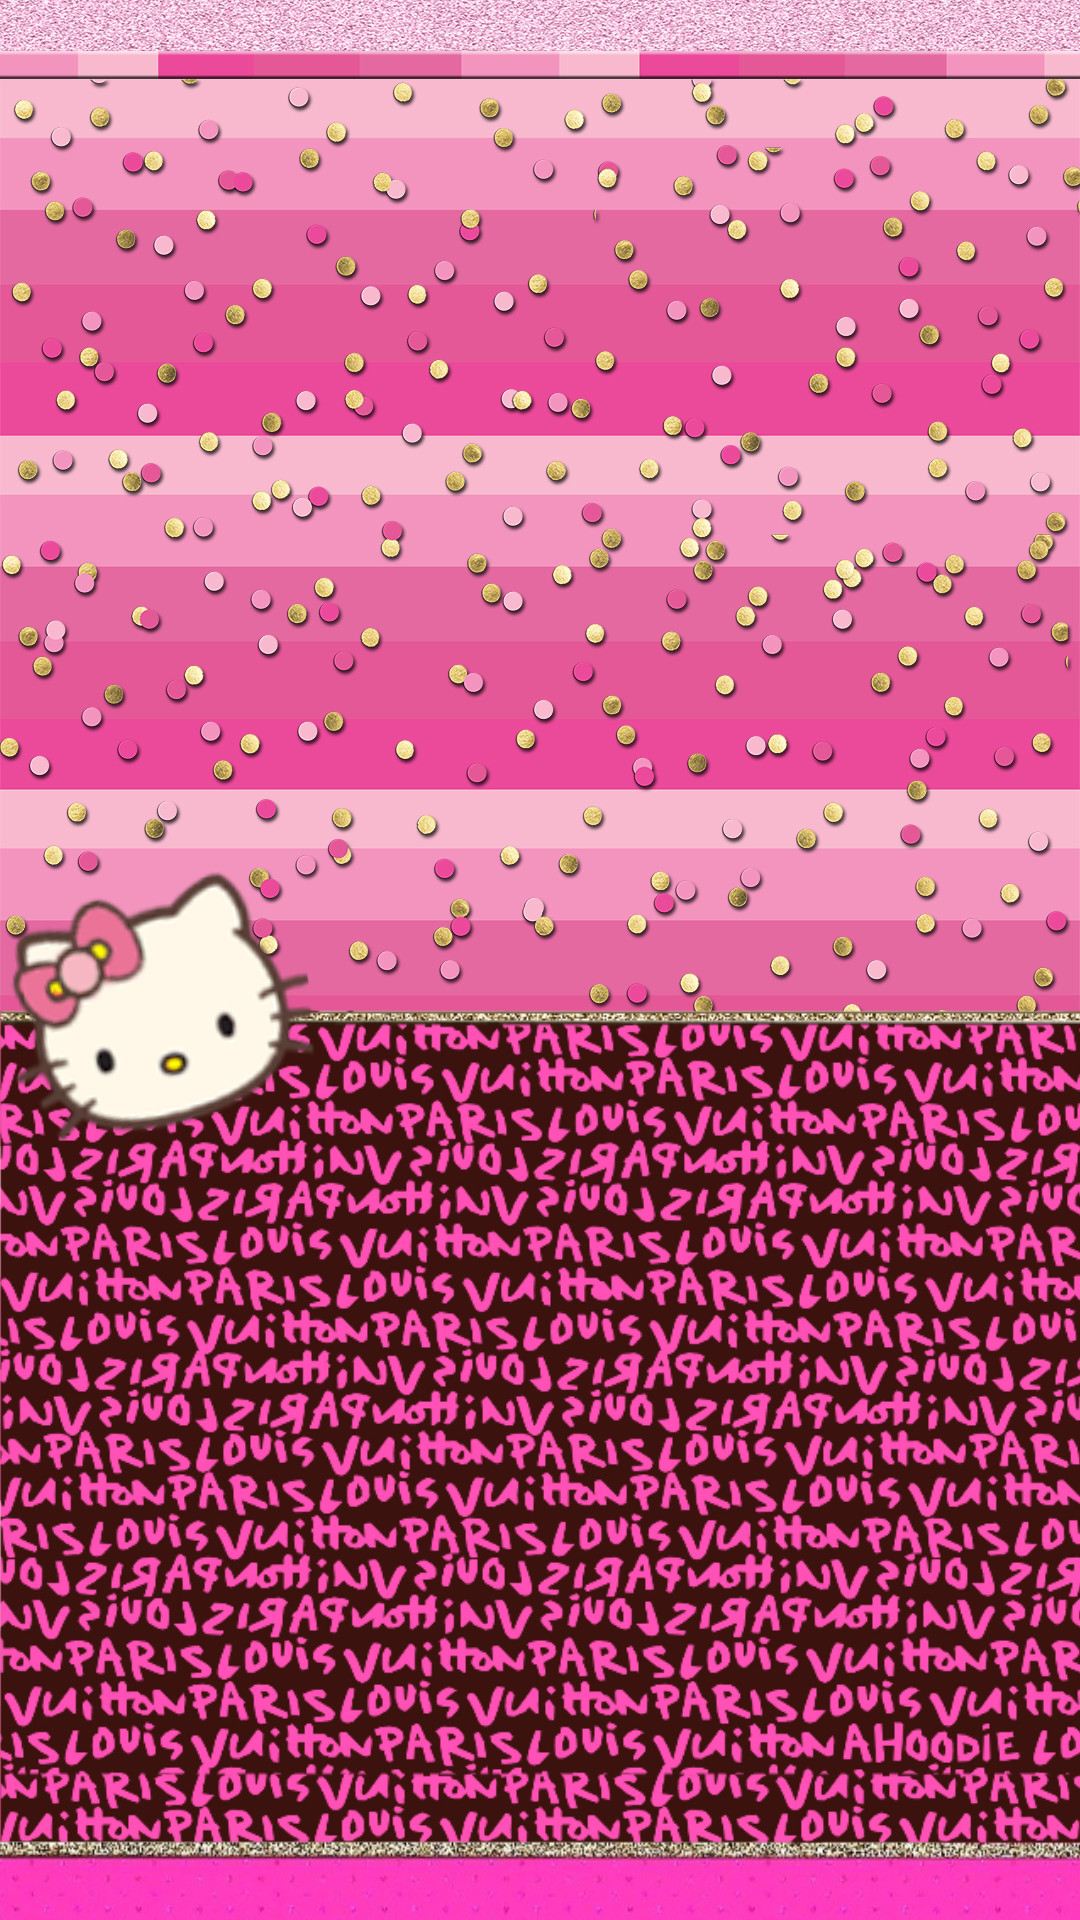 Most Inspiring Wallpaper Hello Kitty Glitter - 95158  Snapshot_624191.jpg